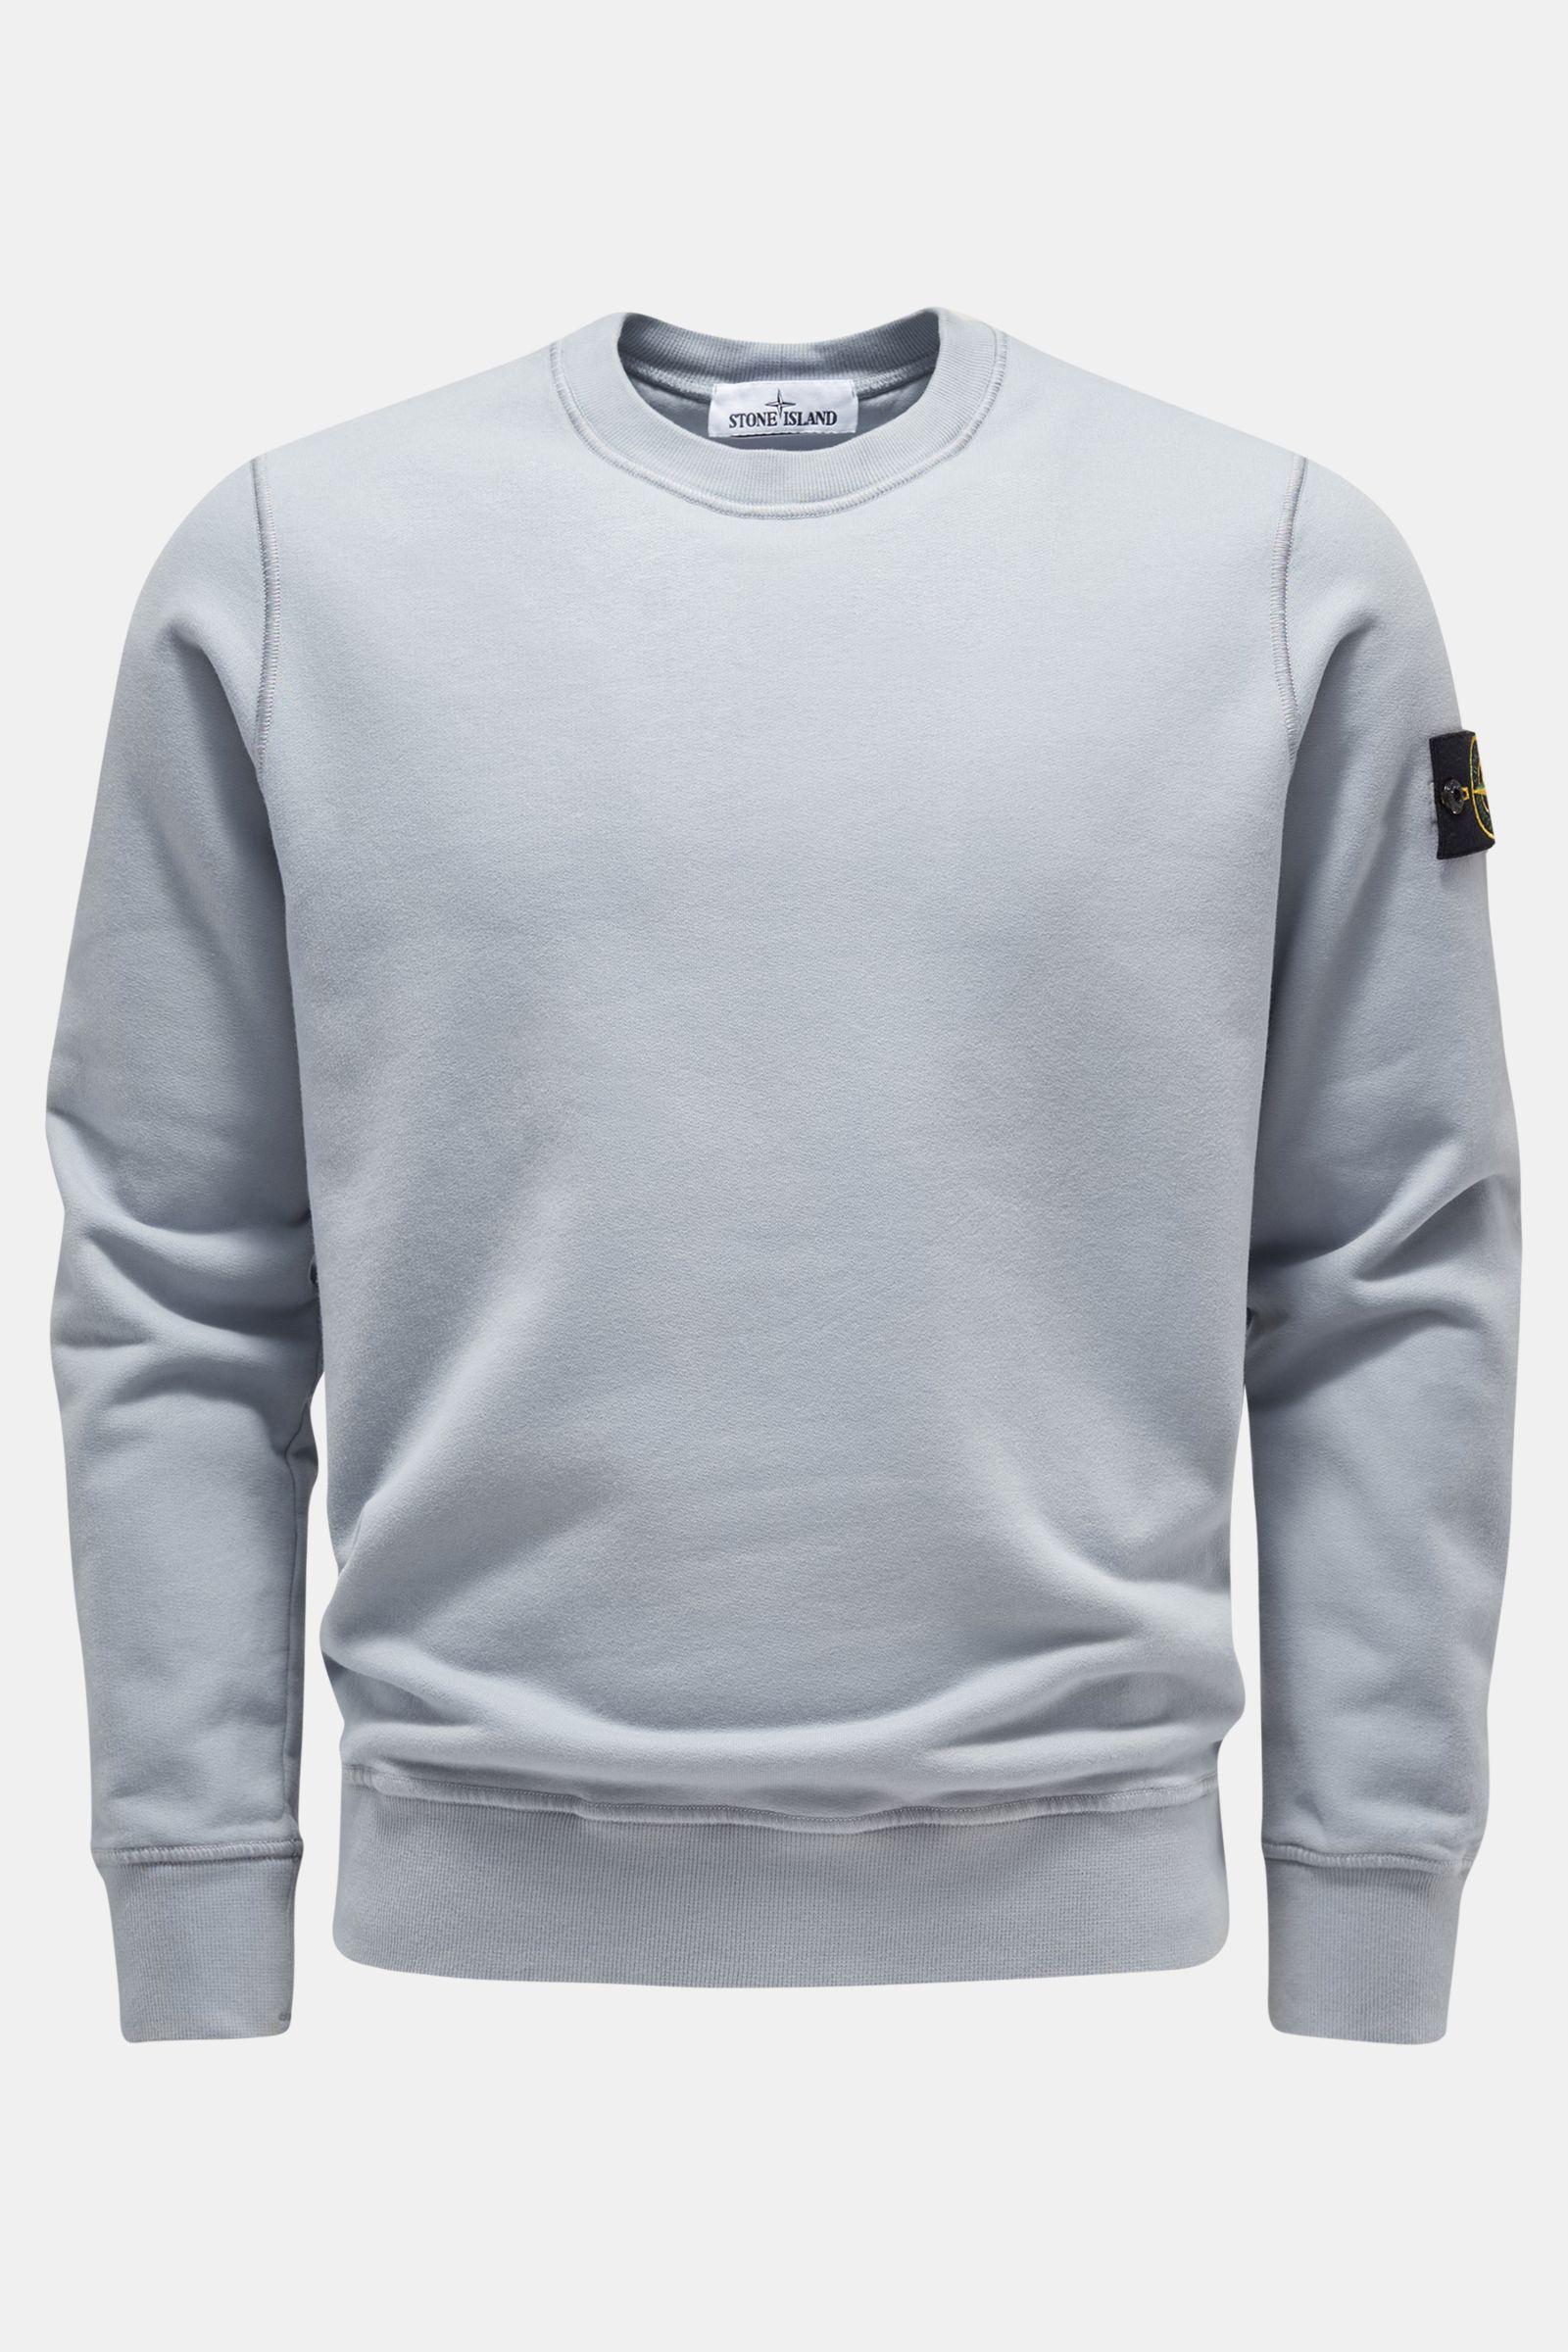 Rundhals-Sweatshirt hellblau